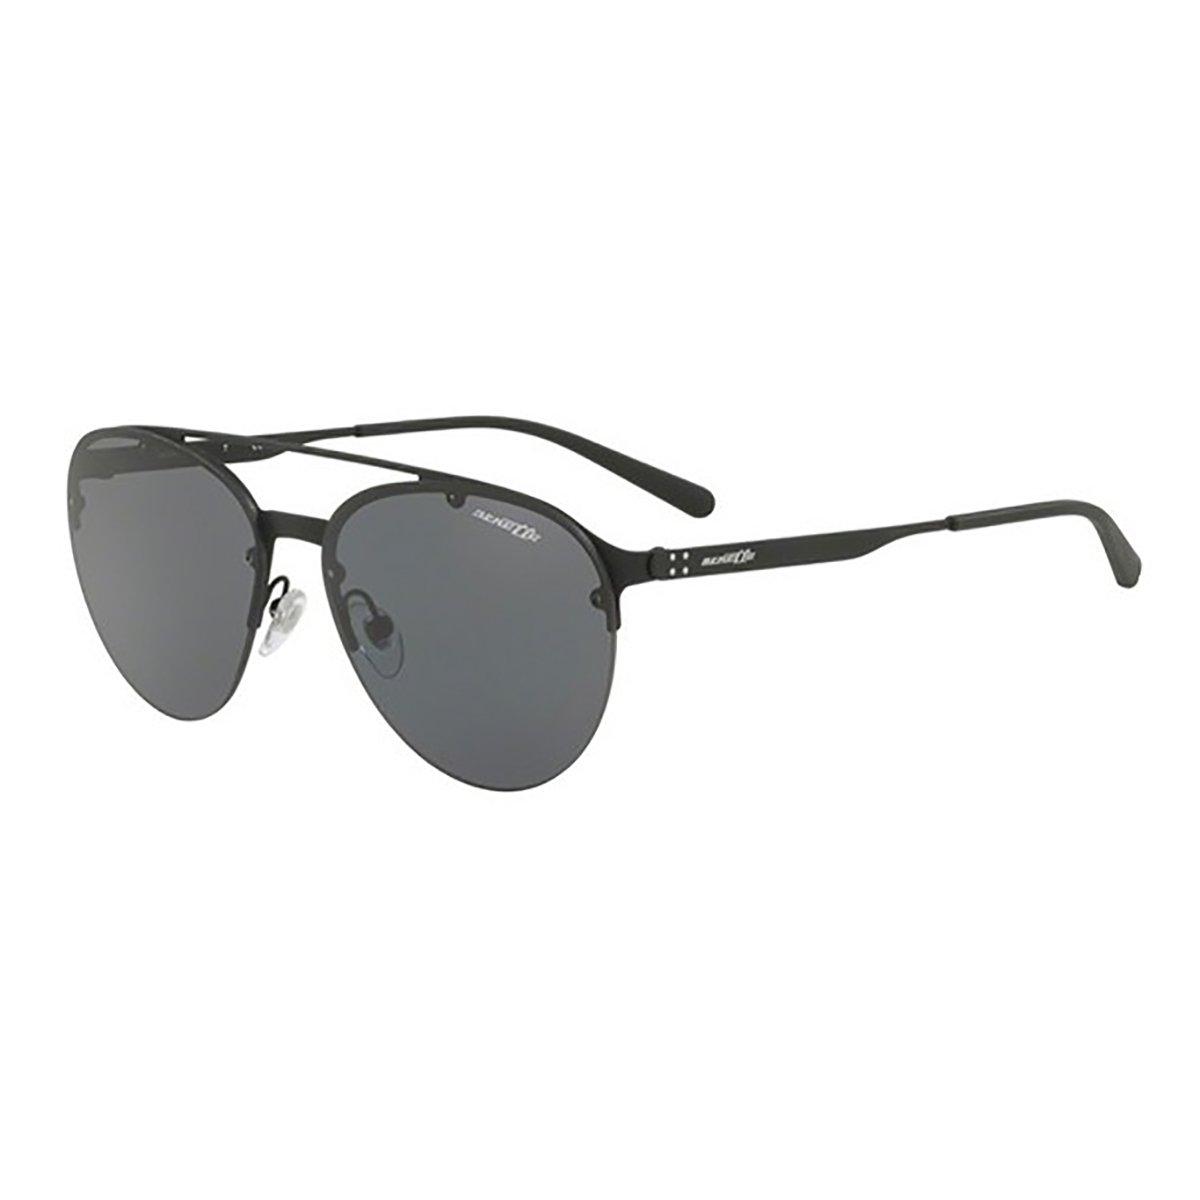 85b5f2363c9ee Compre Óculos de Sol Arnette Dweet em 10X   Tri-Jóia Shop